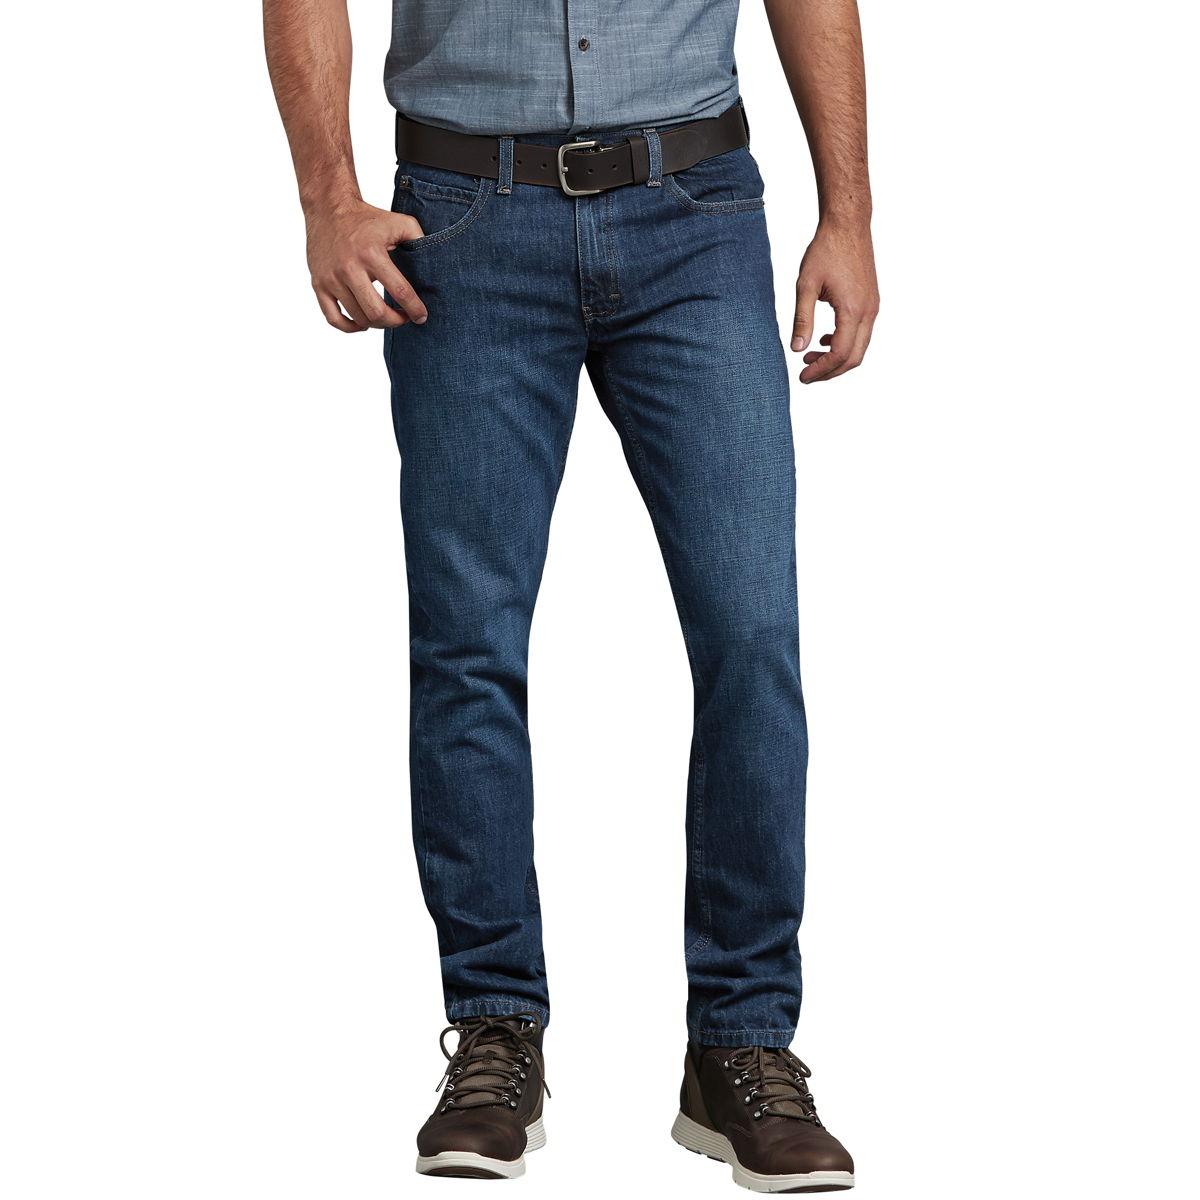 843d49be49 3 pantalones Dickies para toda ocasión